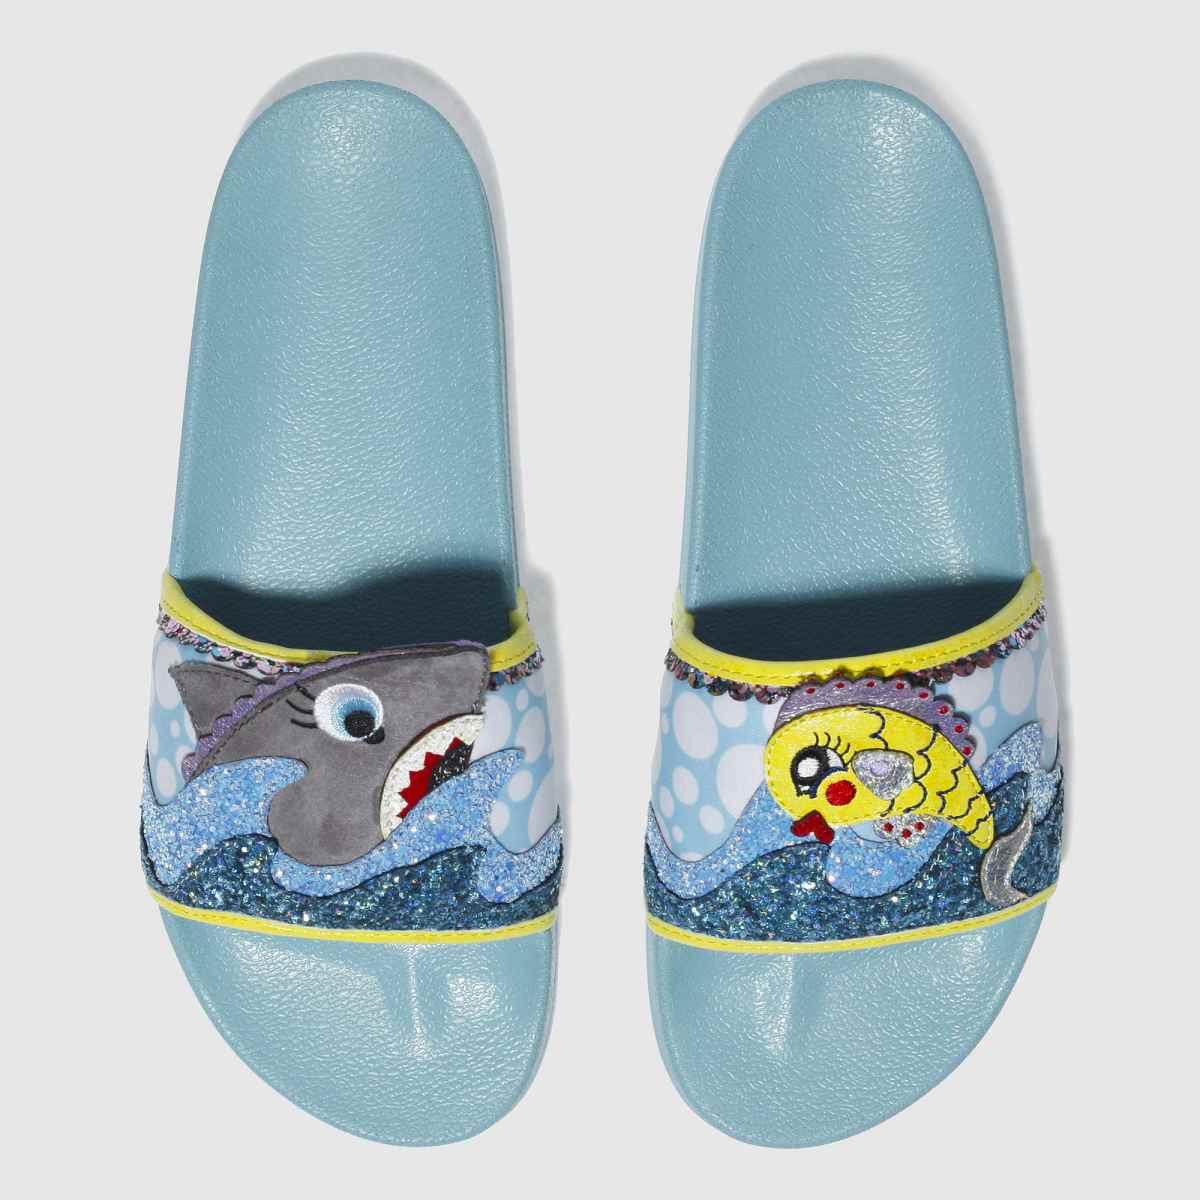 Irregular Choice Blue & Yellow Bubble & Galaxy Slide Sandals